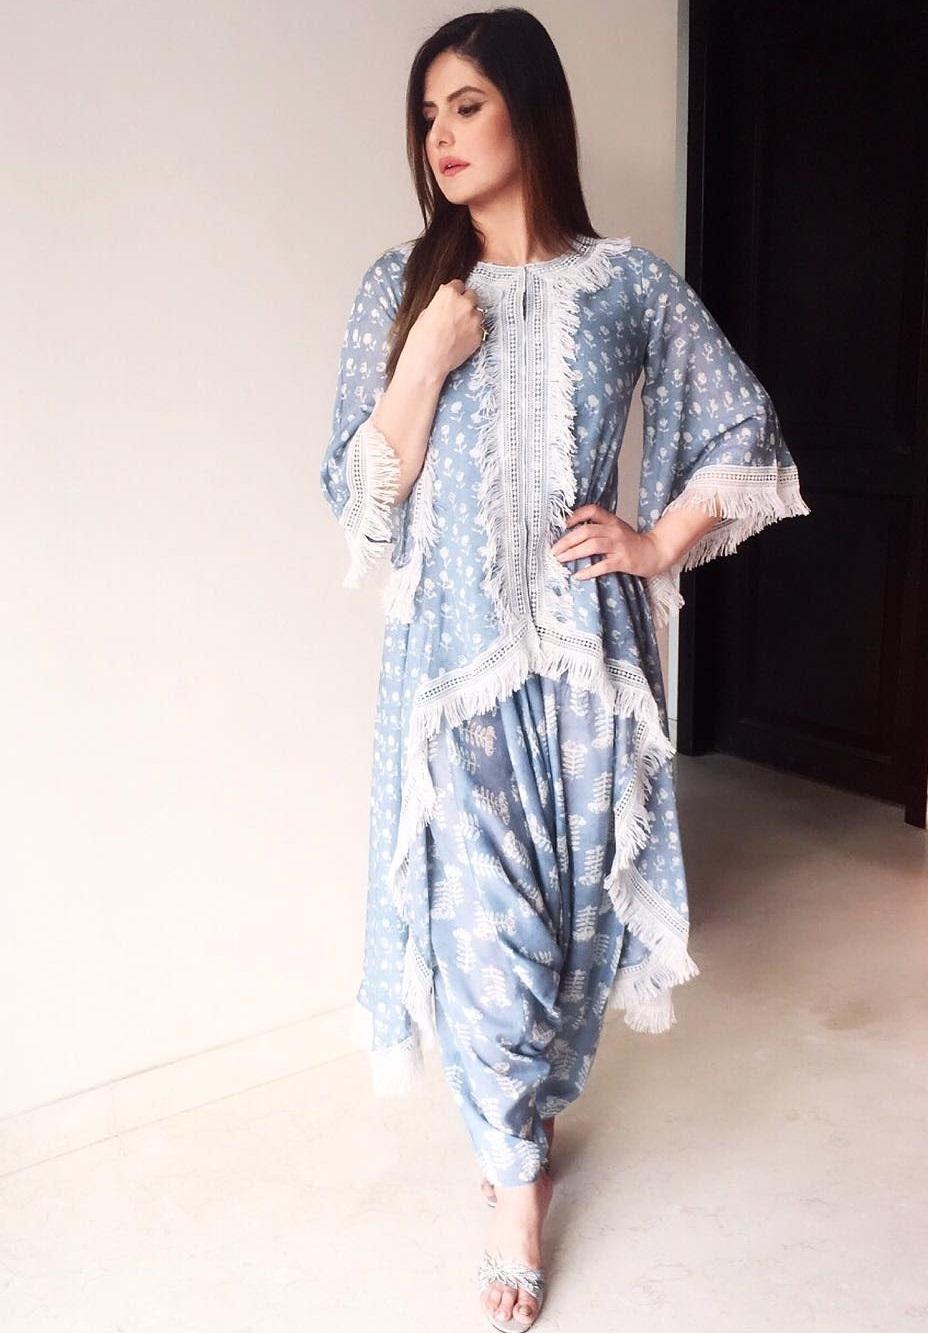 PunjabKesari, जरीन खान इमेज, zarin khan image